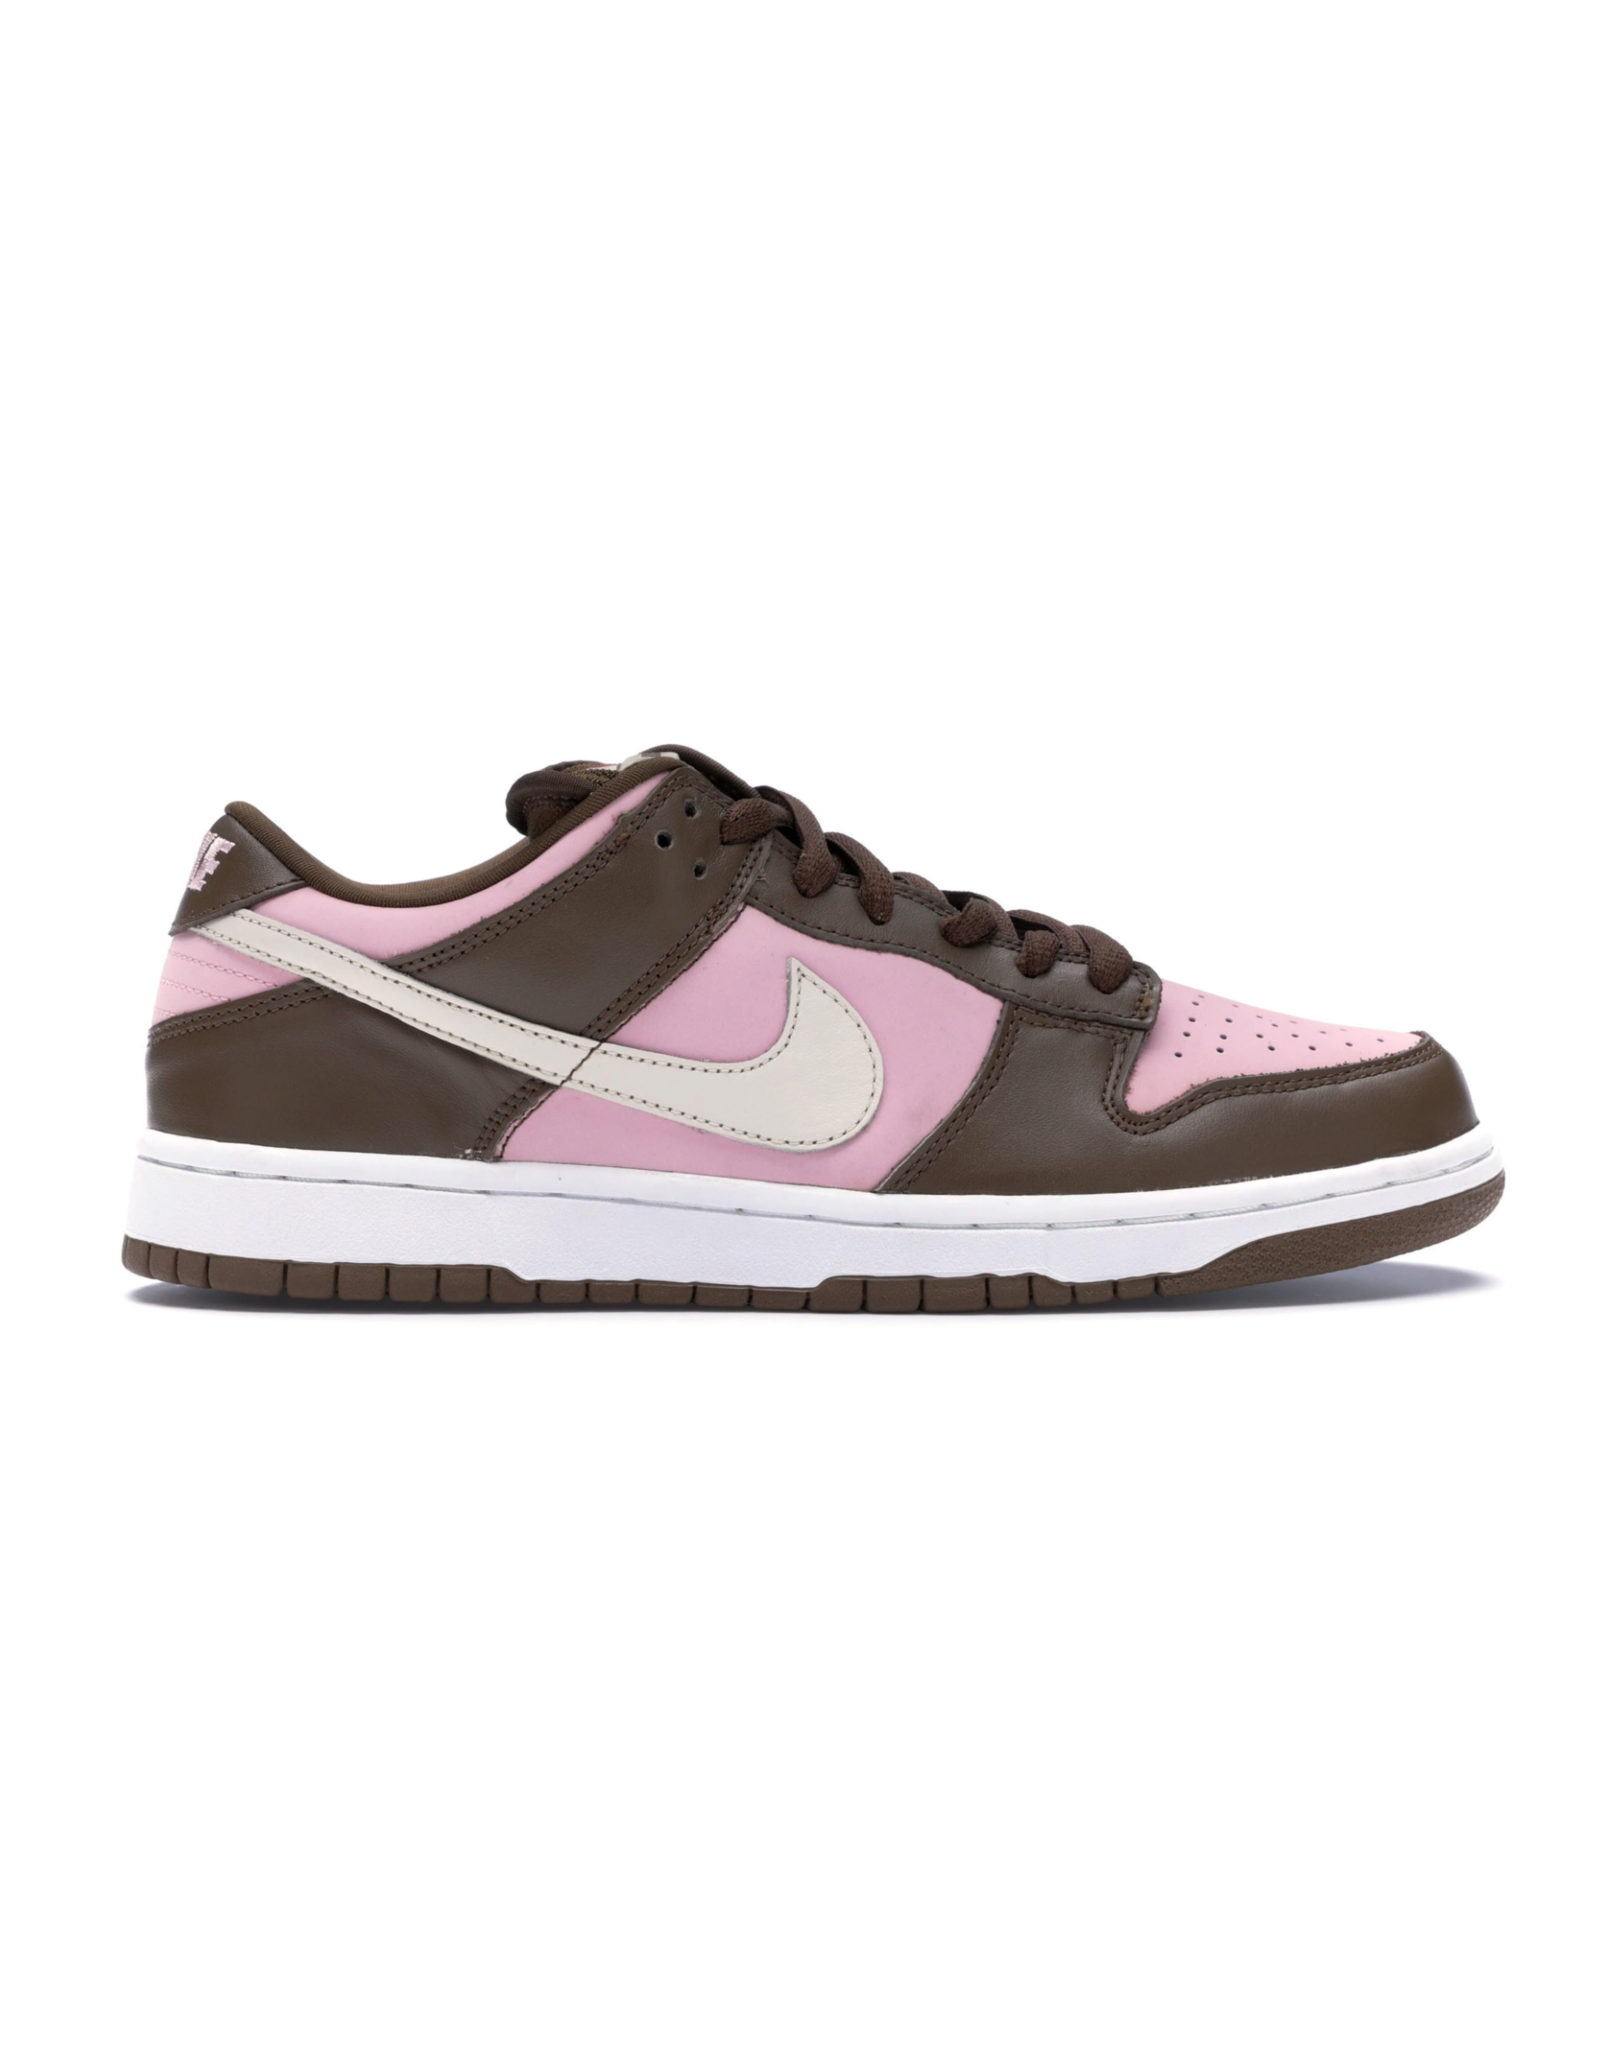 NIKE Nike Dunk SB Low Stussy Cherry